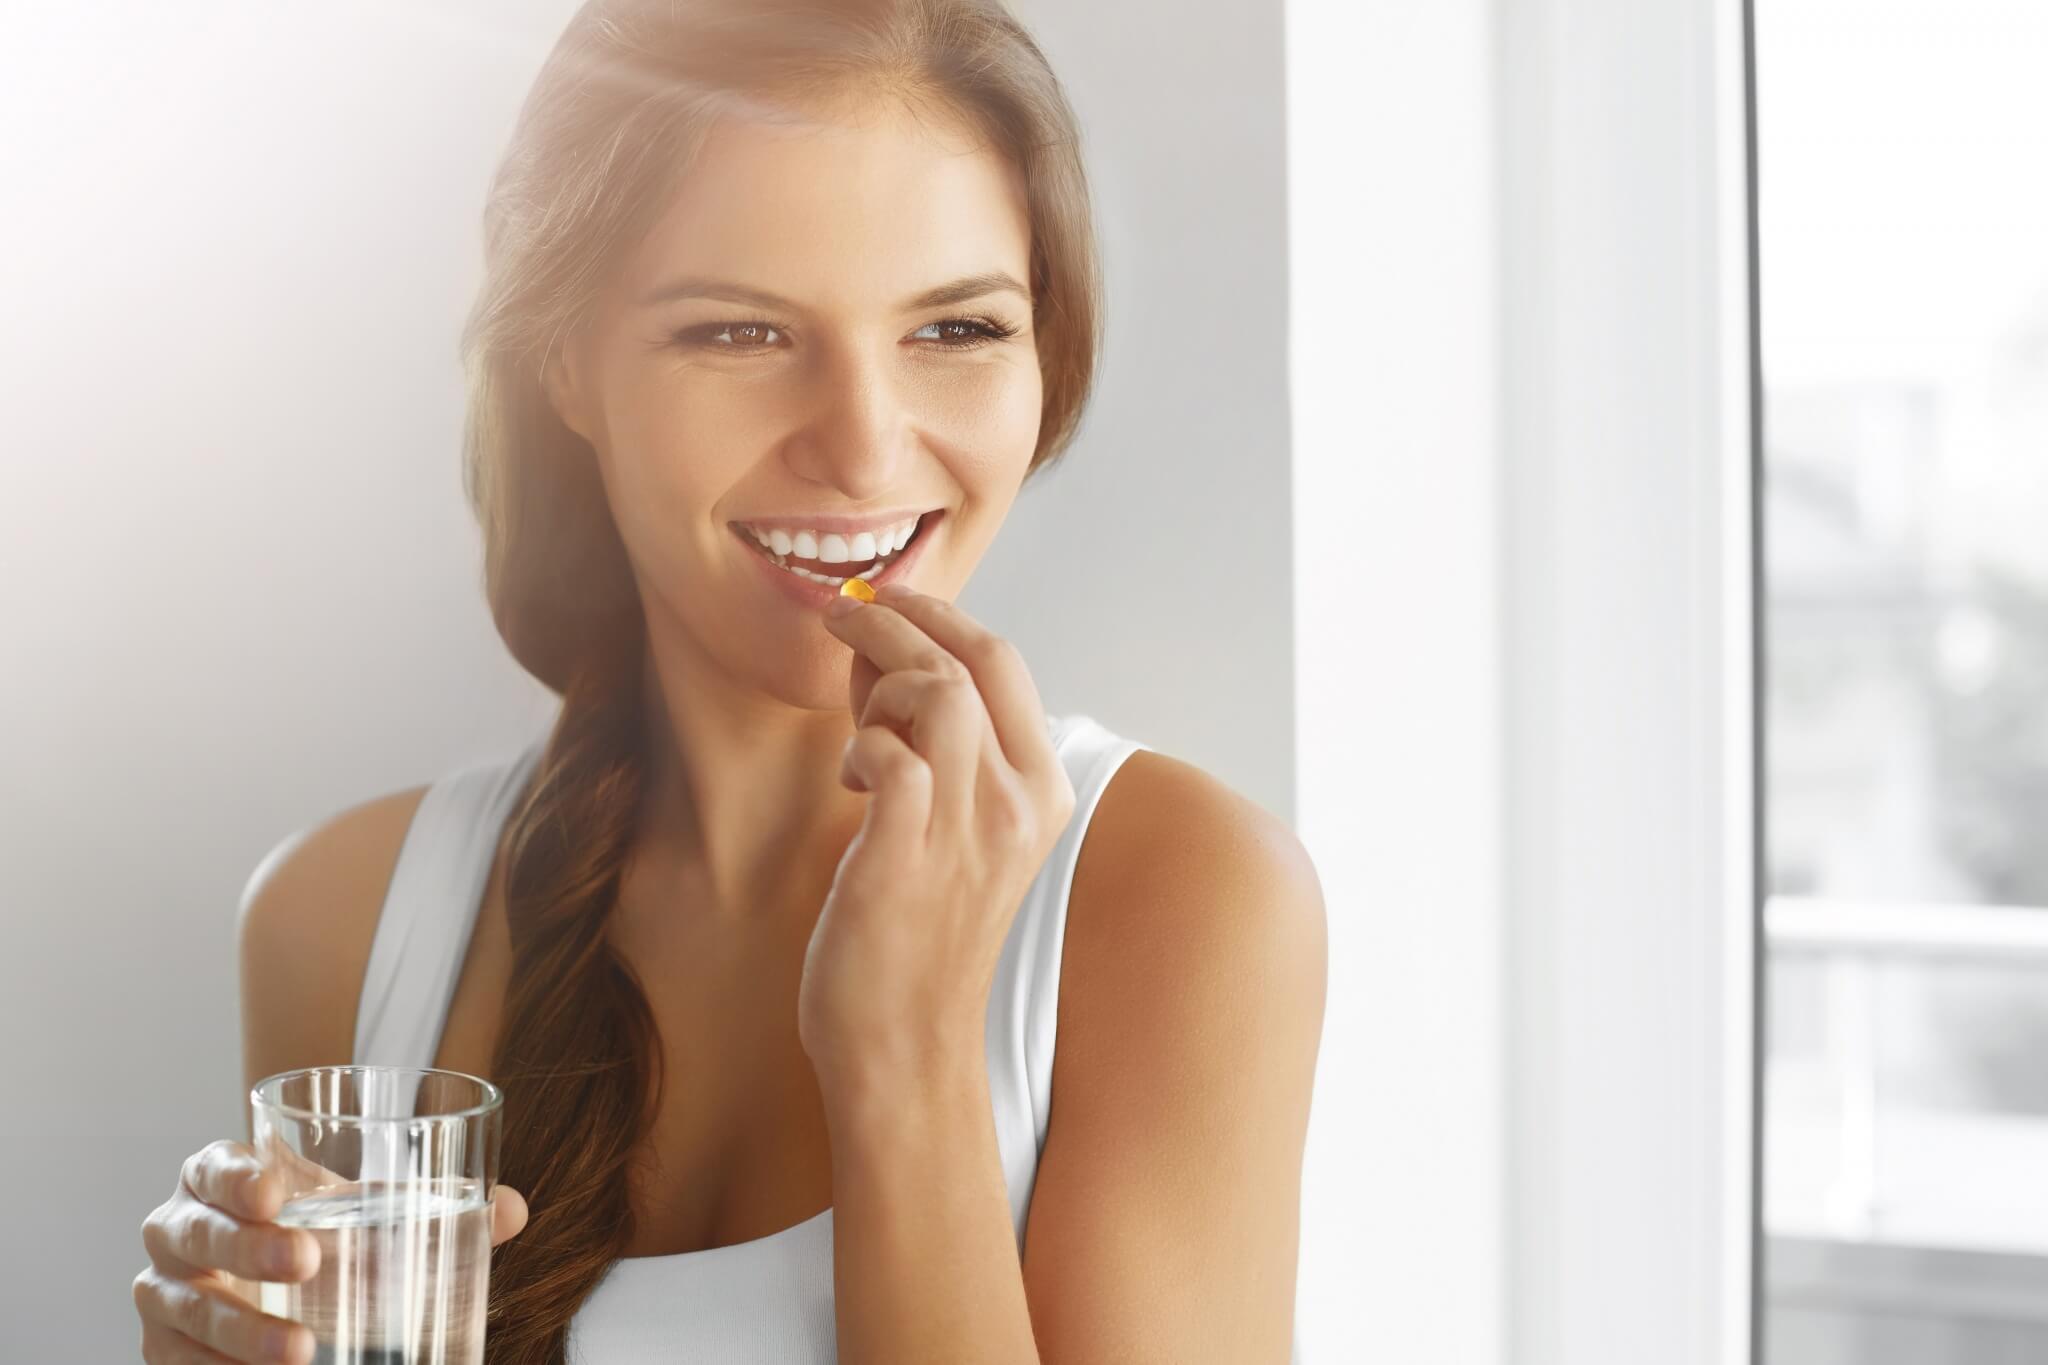 Tomar-suplementos-vitamínicos